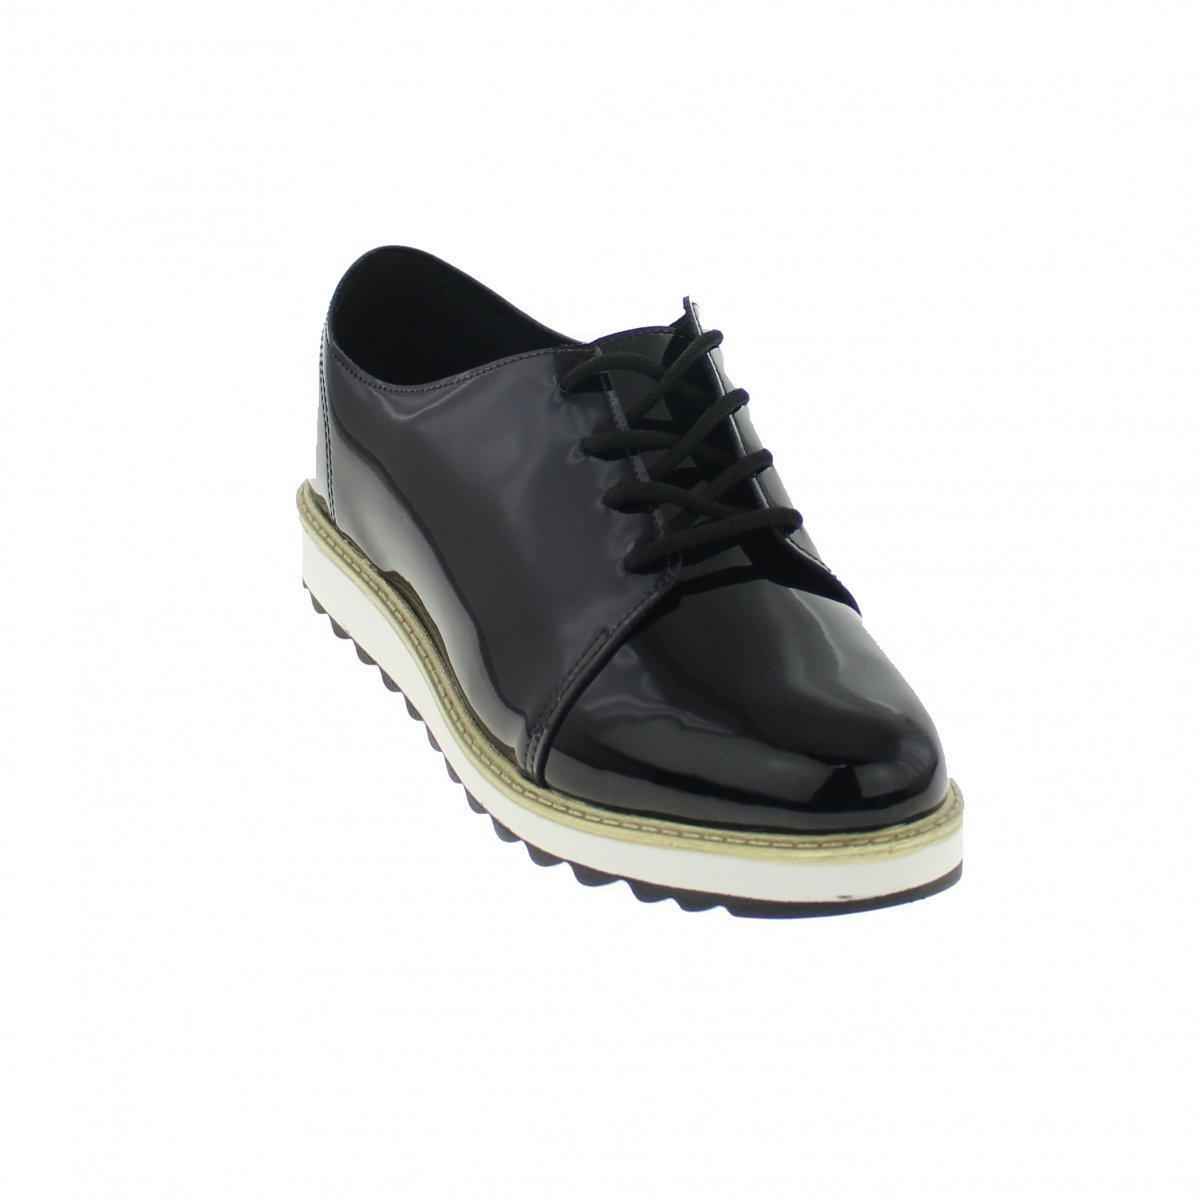 a36611826 Sapato infantil oxford molekinha verniz feminino preto compre jpg 544x544  Sapato infantil oxford molekinha verniz preto